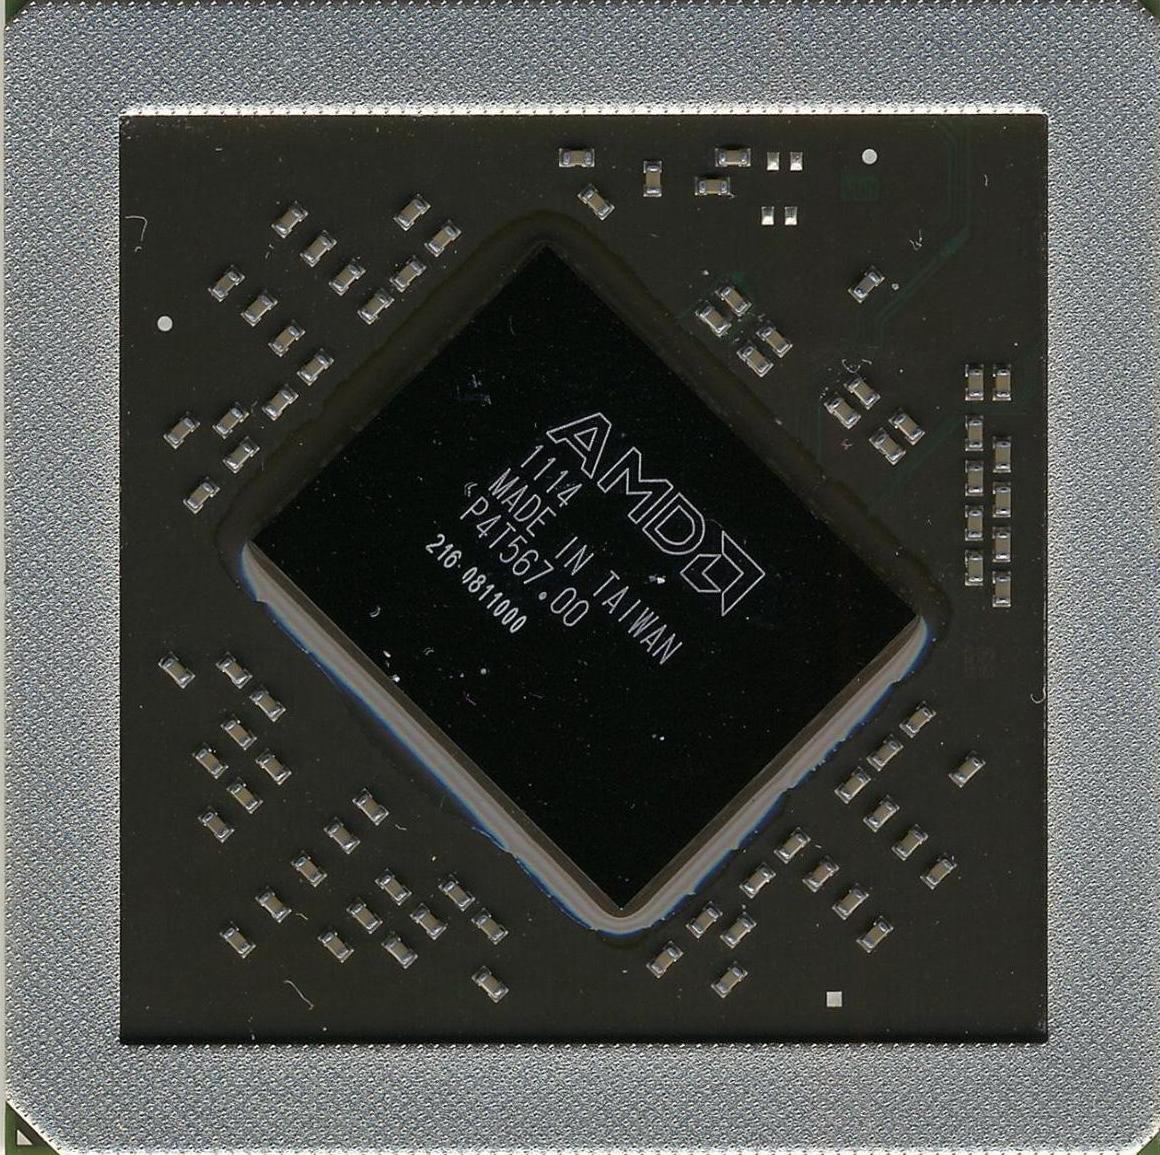 216-0811000 HD 6970